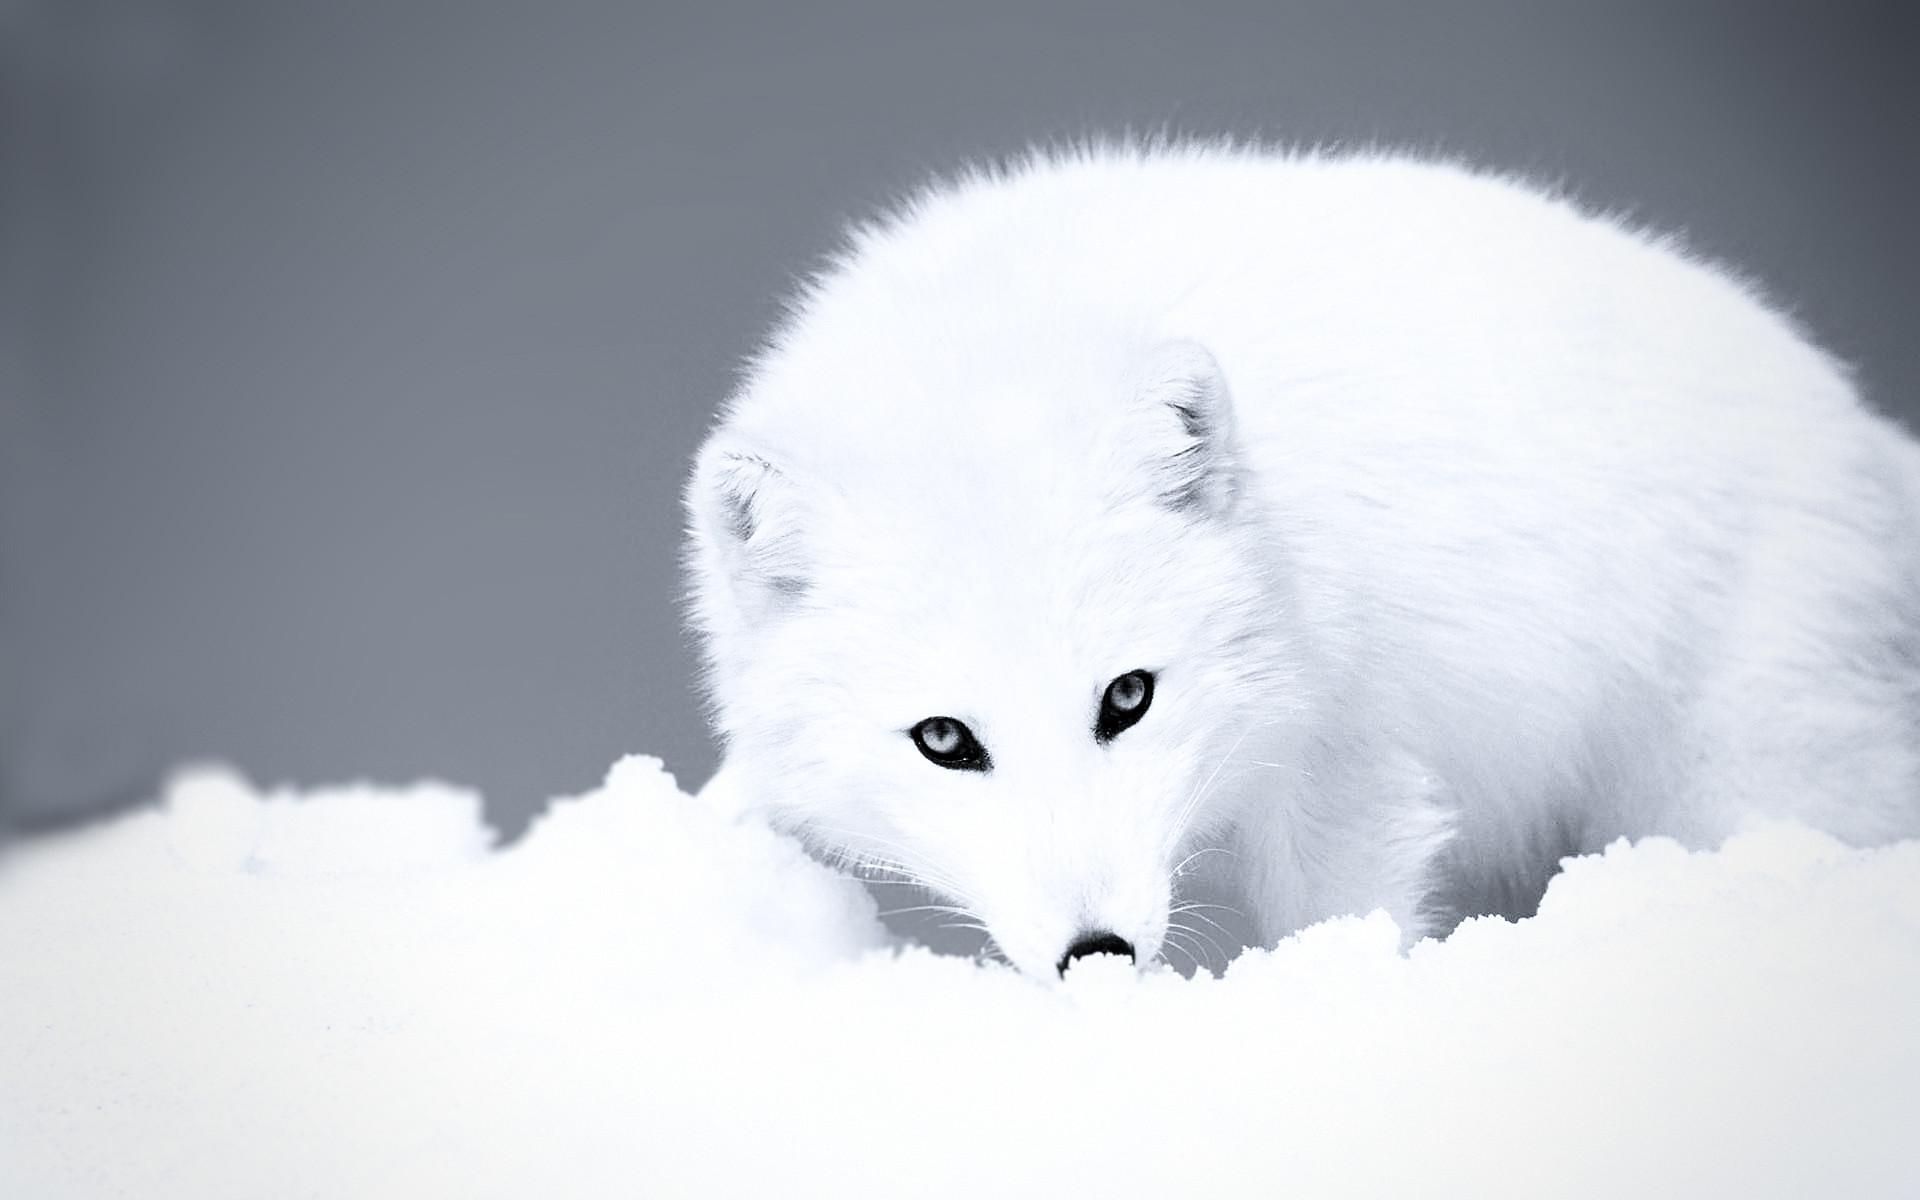 Cute Winter Animal Wallpaper 48 Images